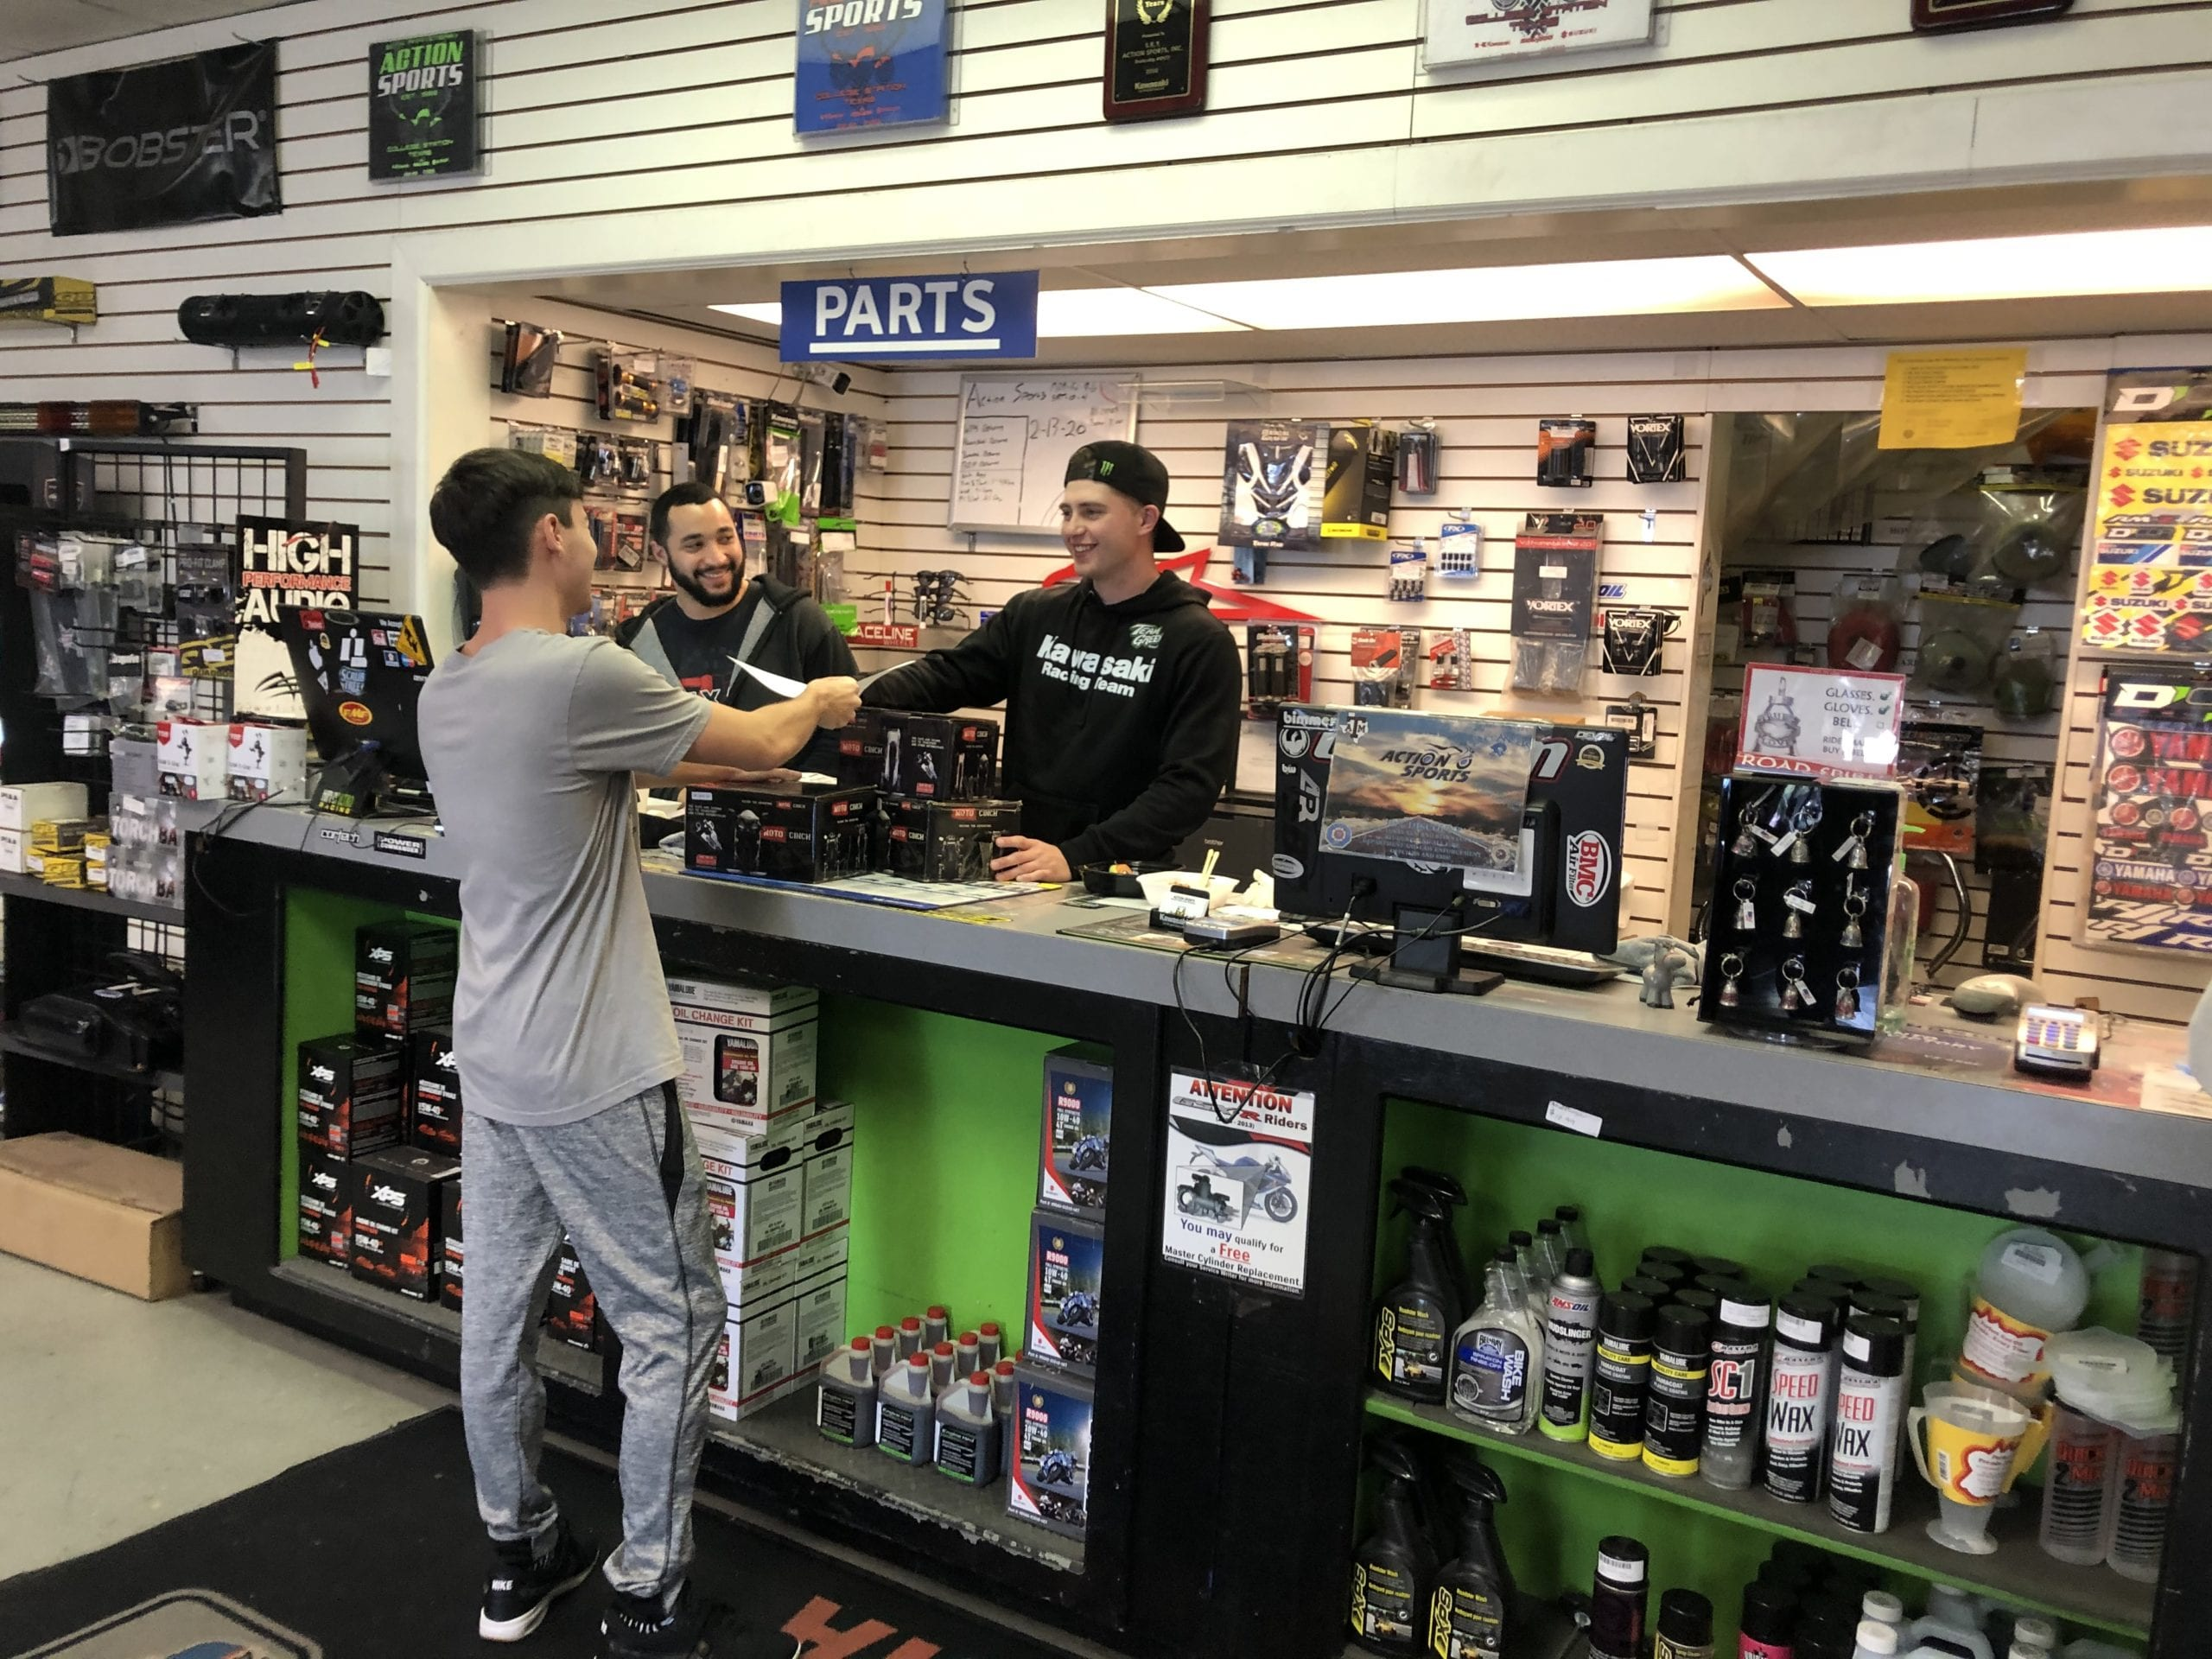 Purchasing at dealership